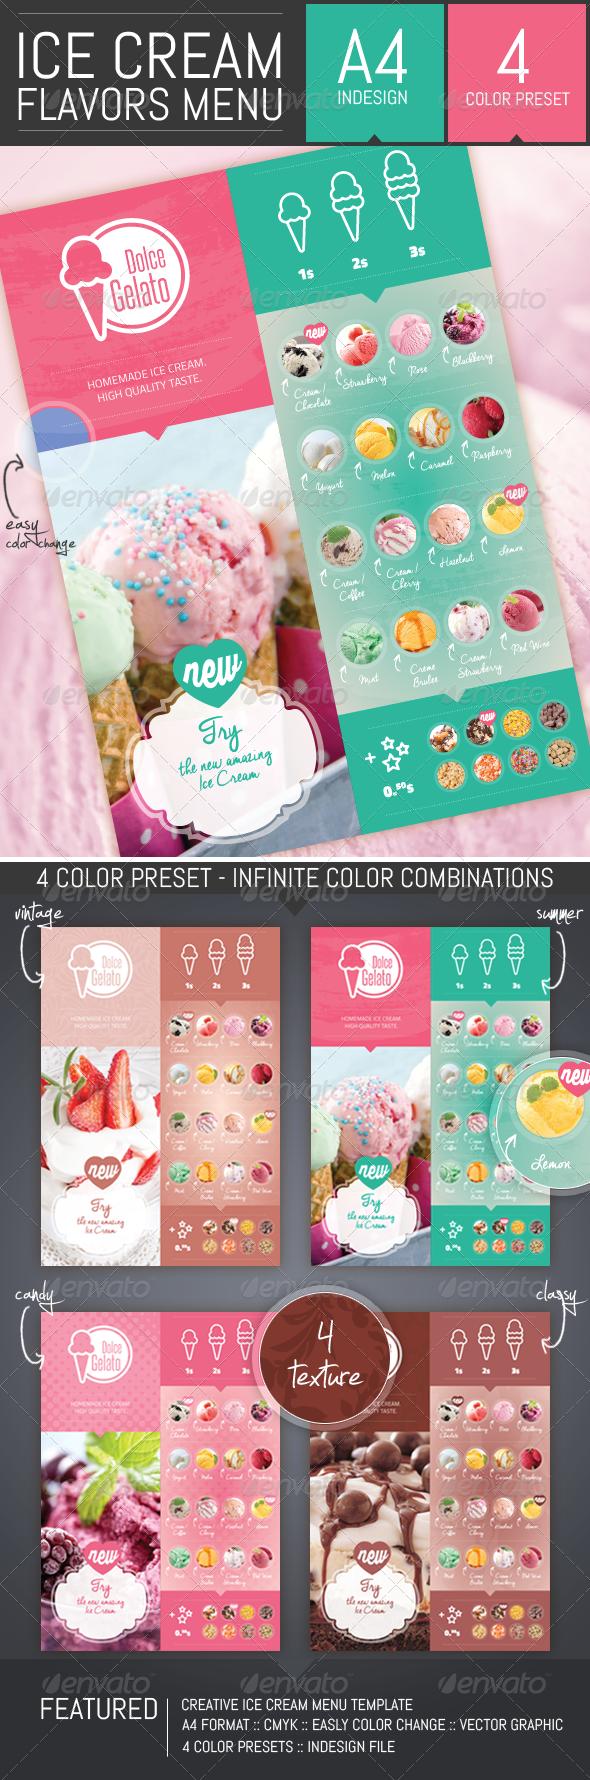 Ice Cream Flavor Menu Template - Food Menus Print Templates